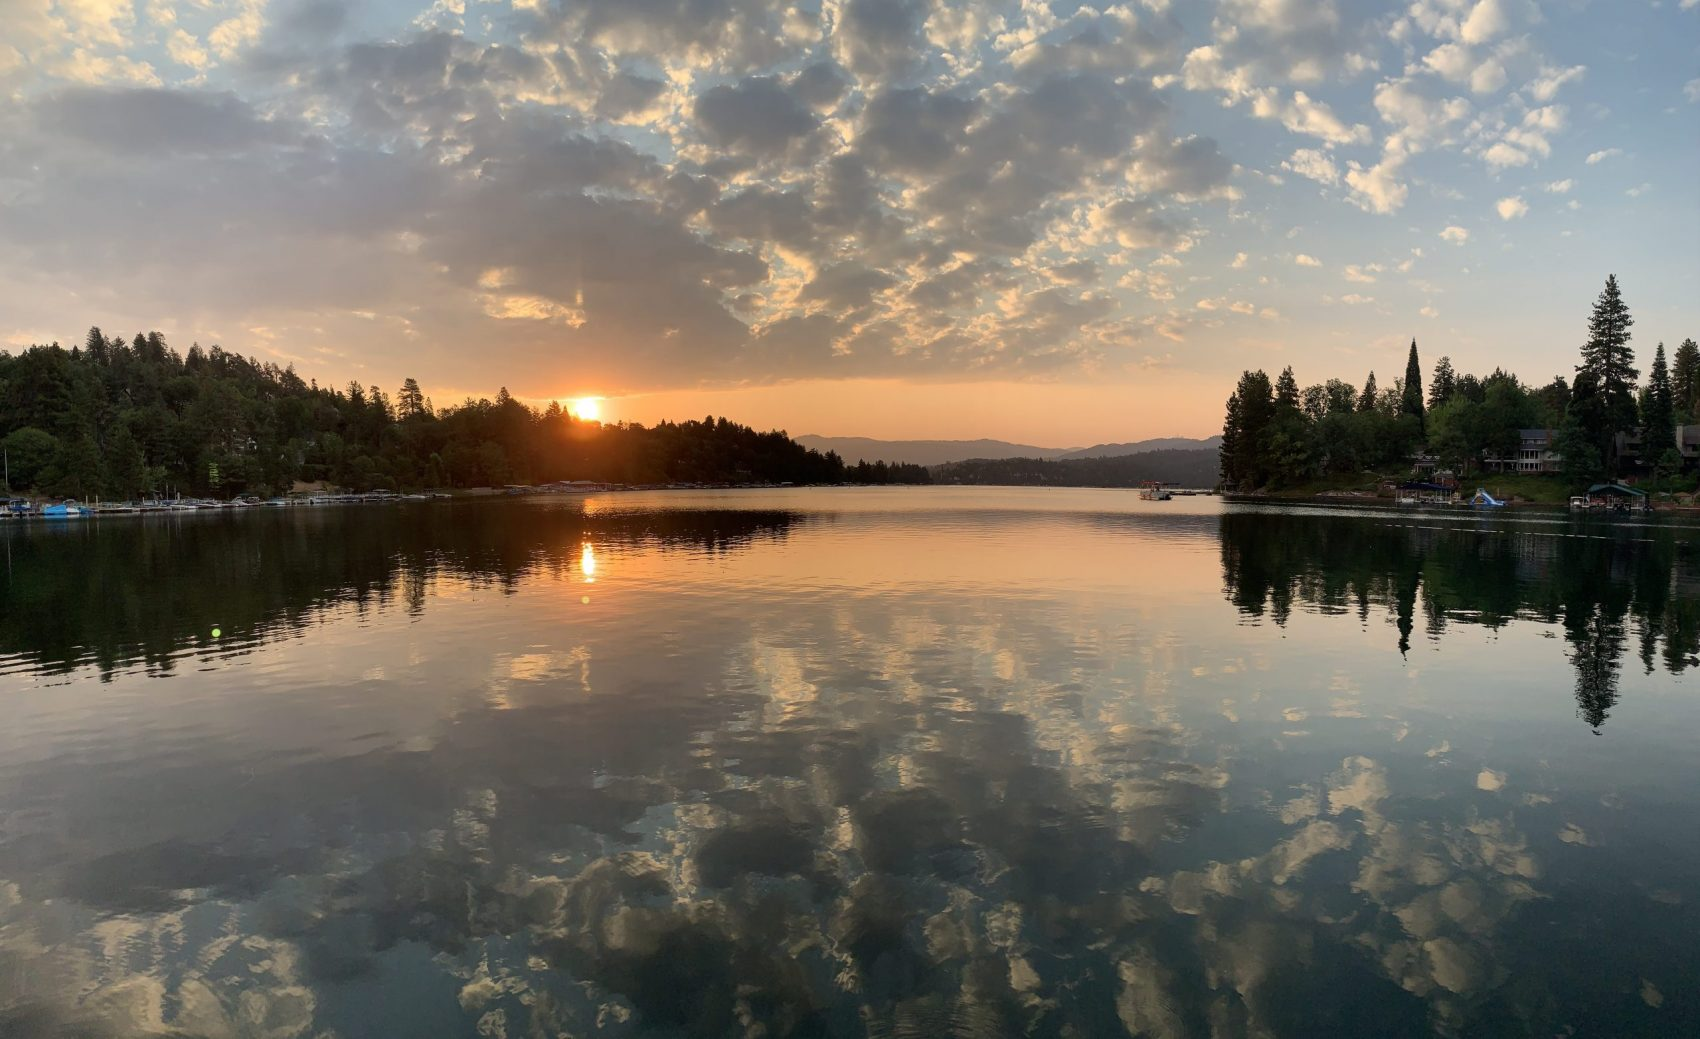 Sunrise, lake arrowhead